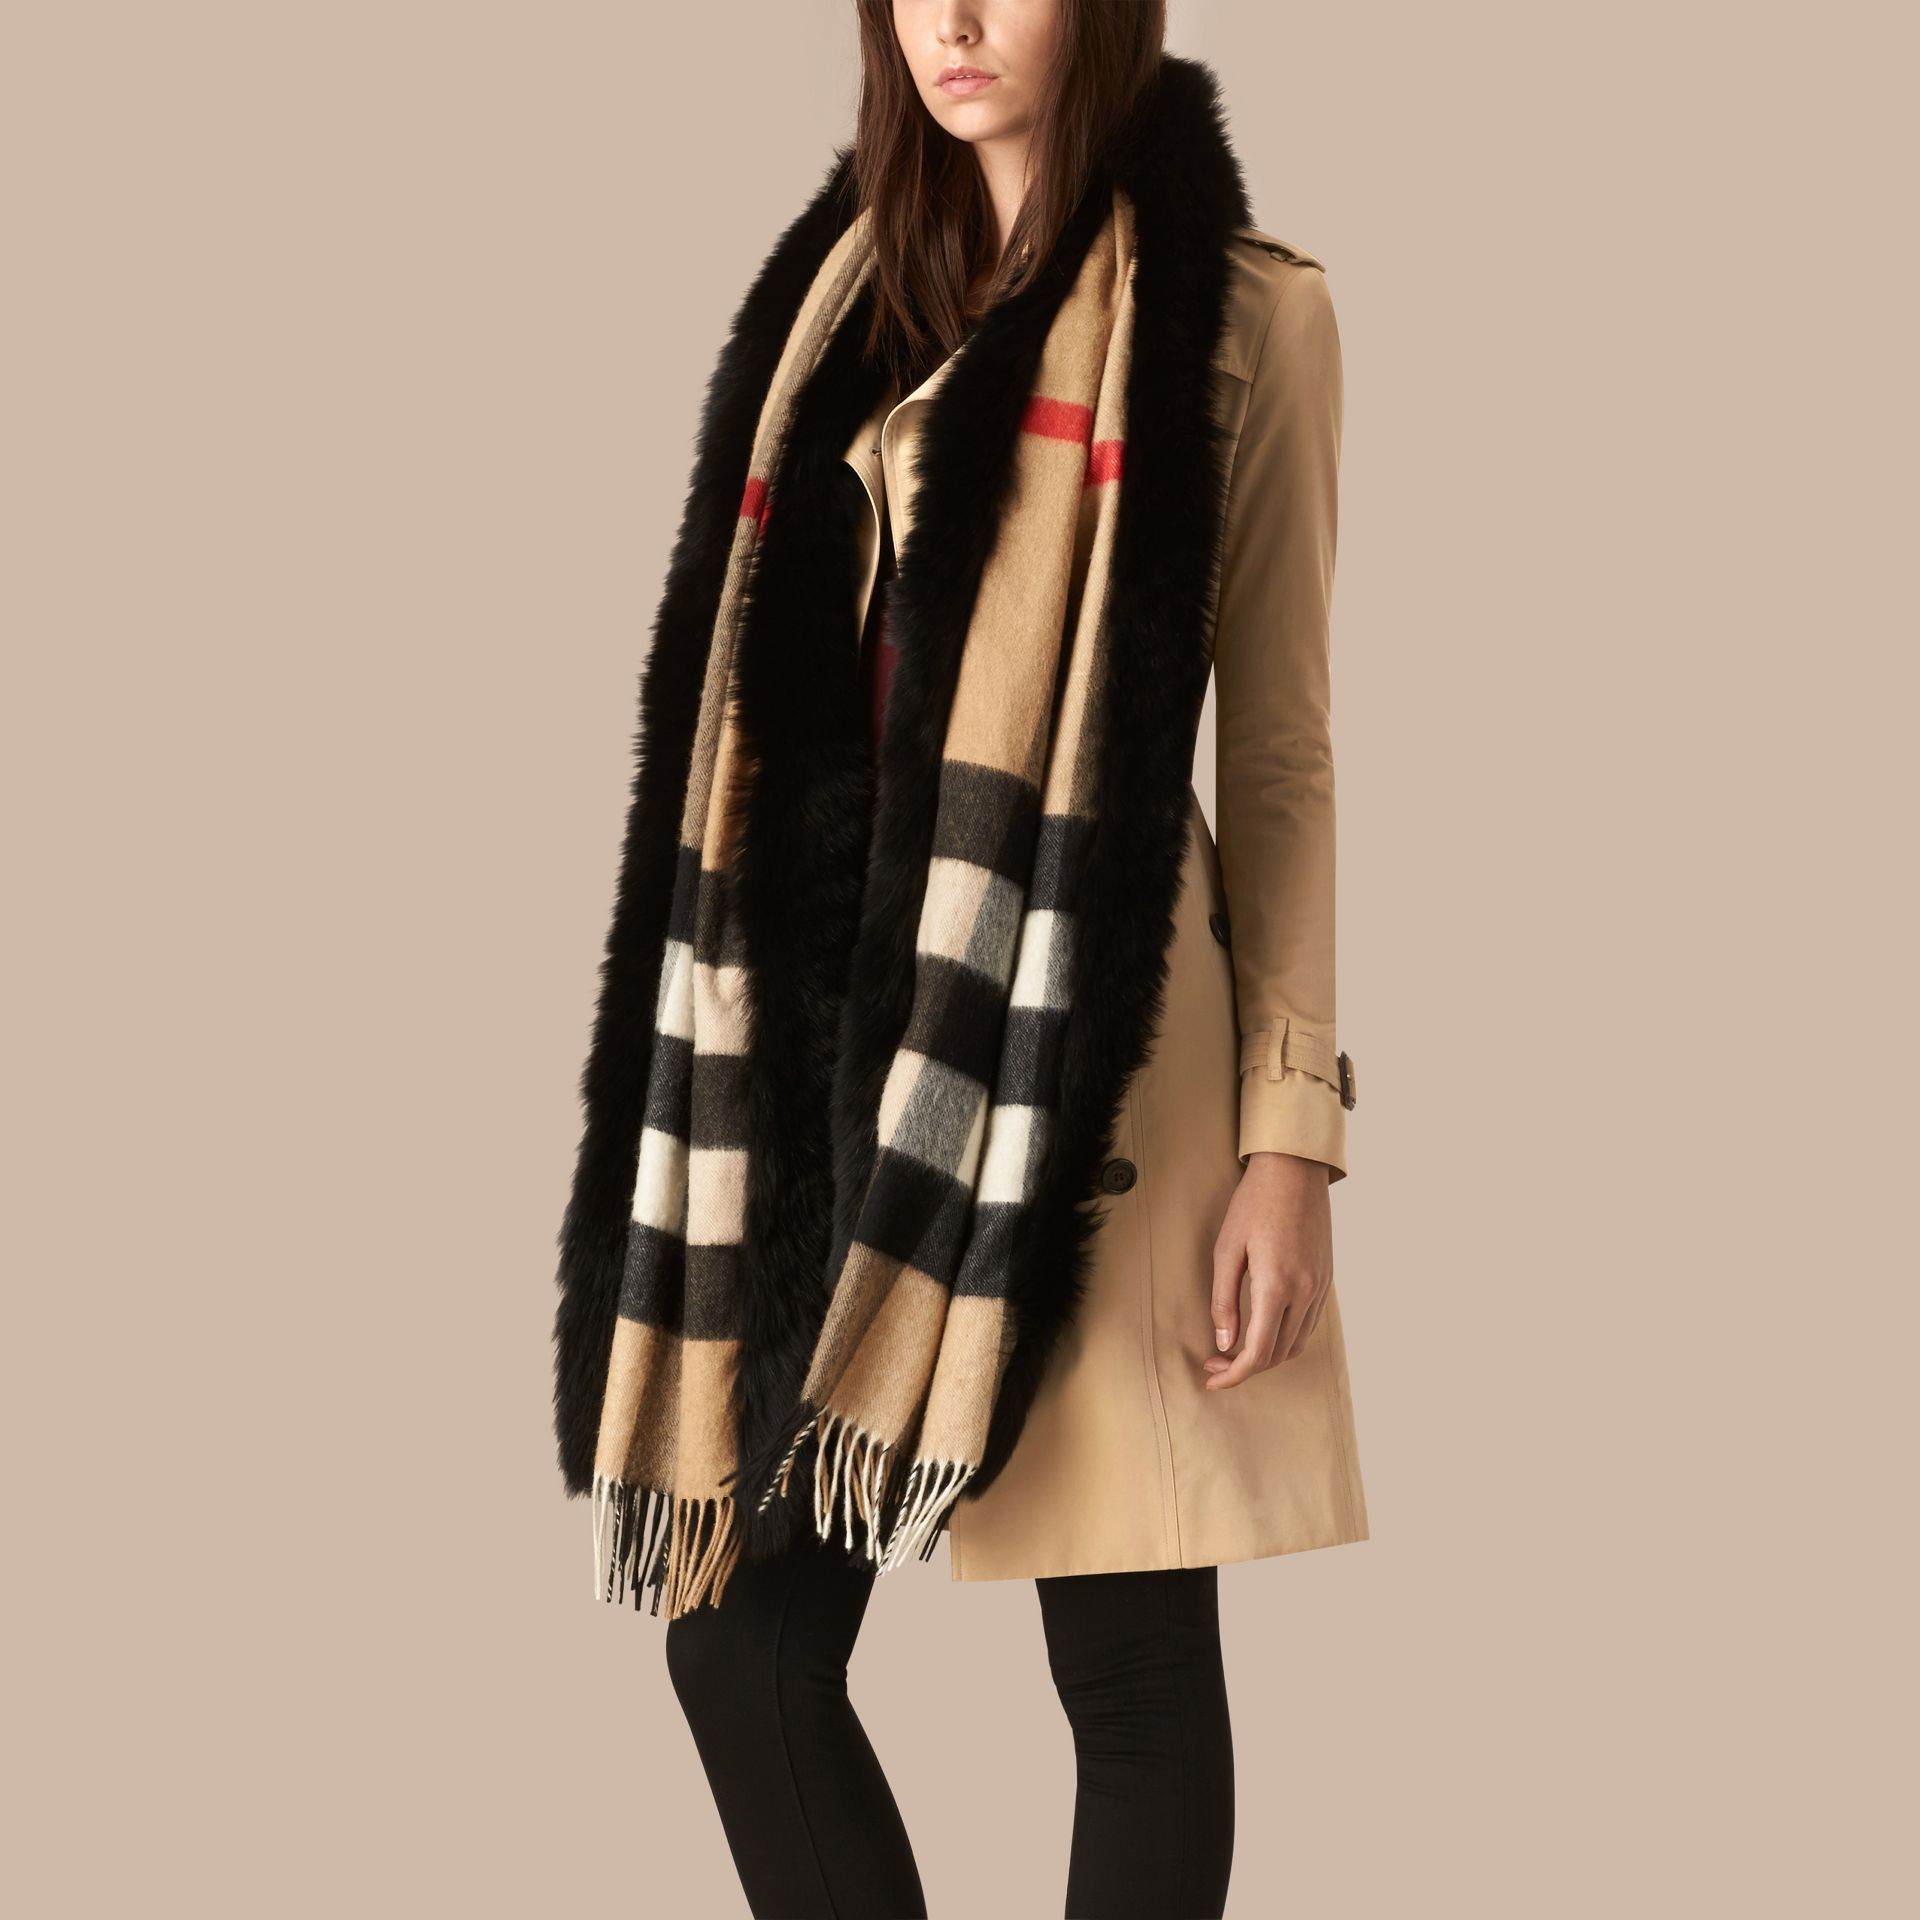 Camel/black Fur-trimmed Check Cashmere Scarf - gallery image 3